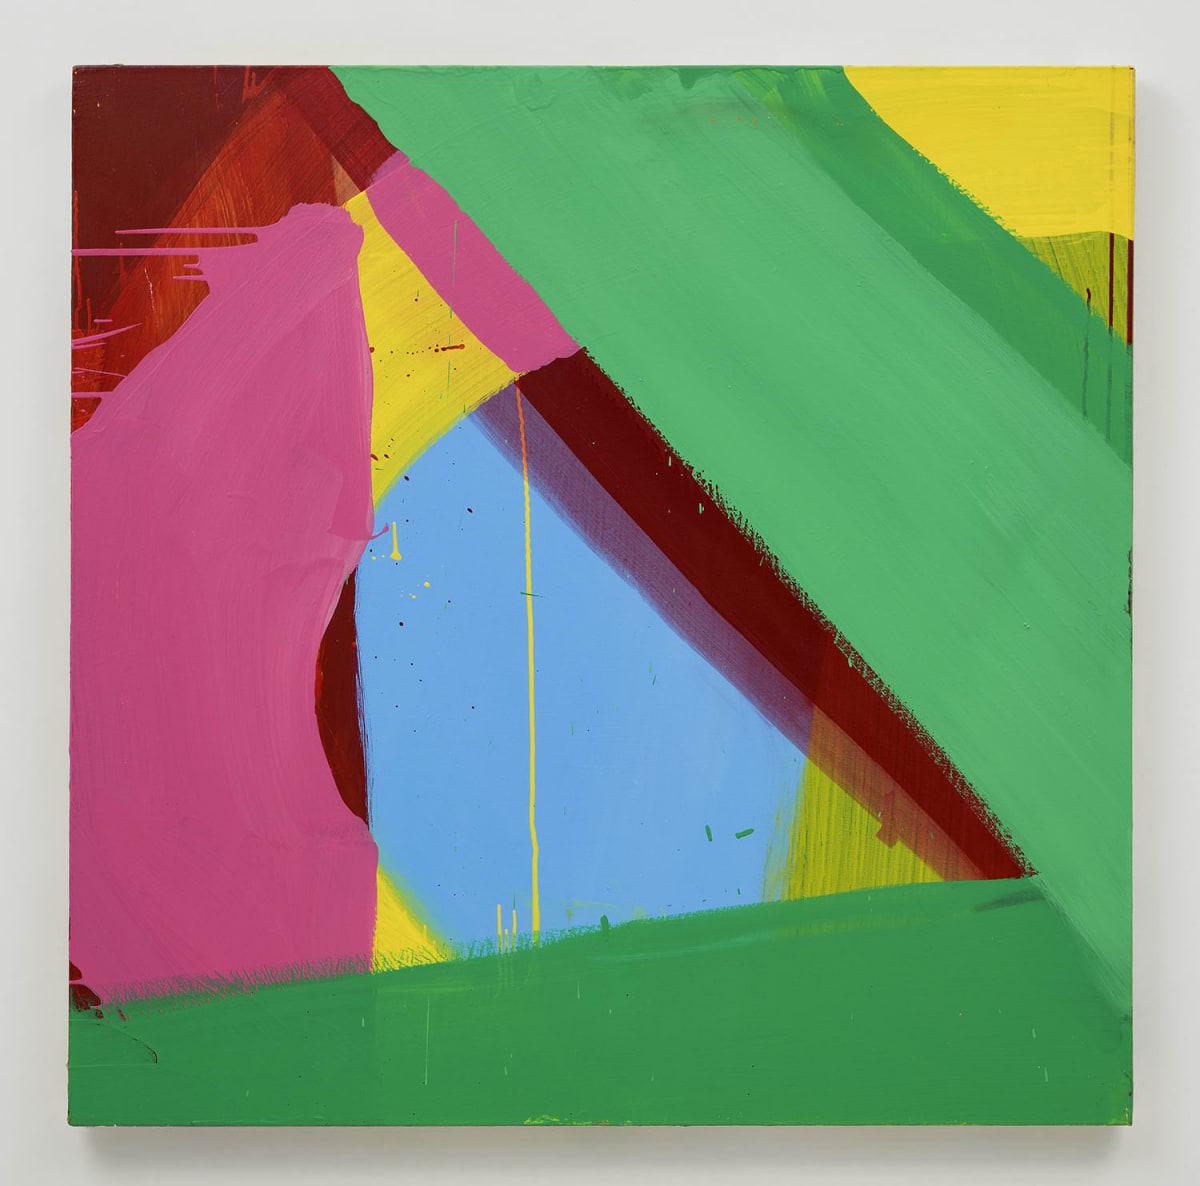 Cat Balco, Blue Triangle, 2019, Acrylic on canvas ,48 x 48 inches (121.9 x 121.9 cm)